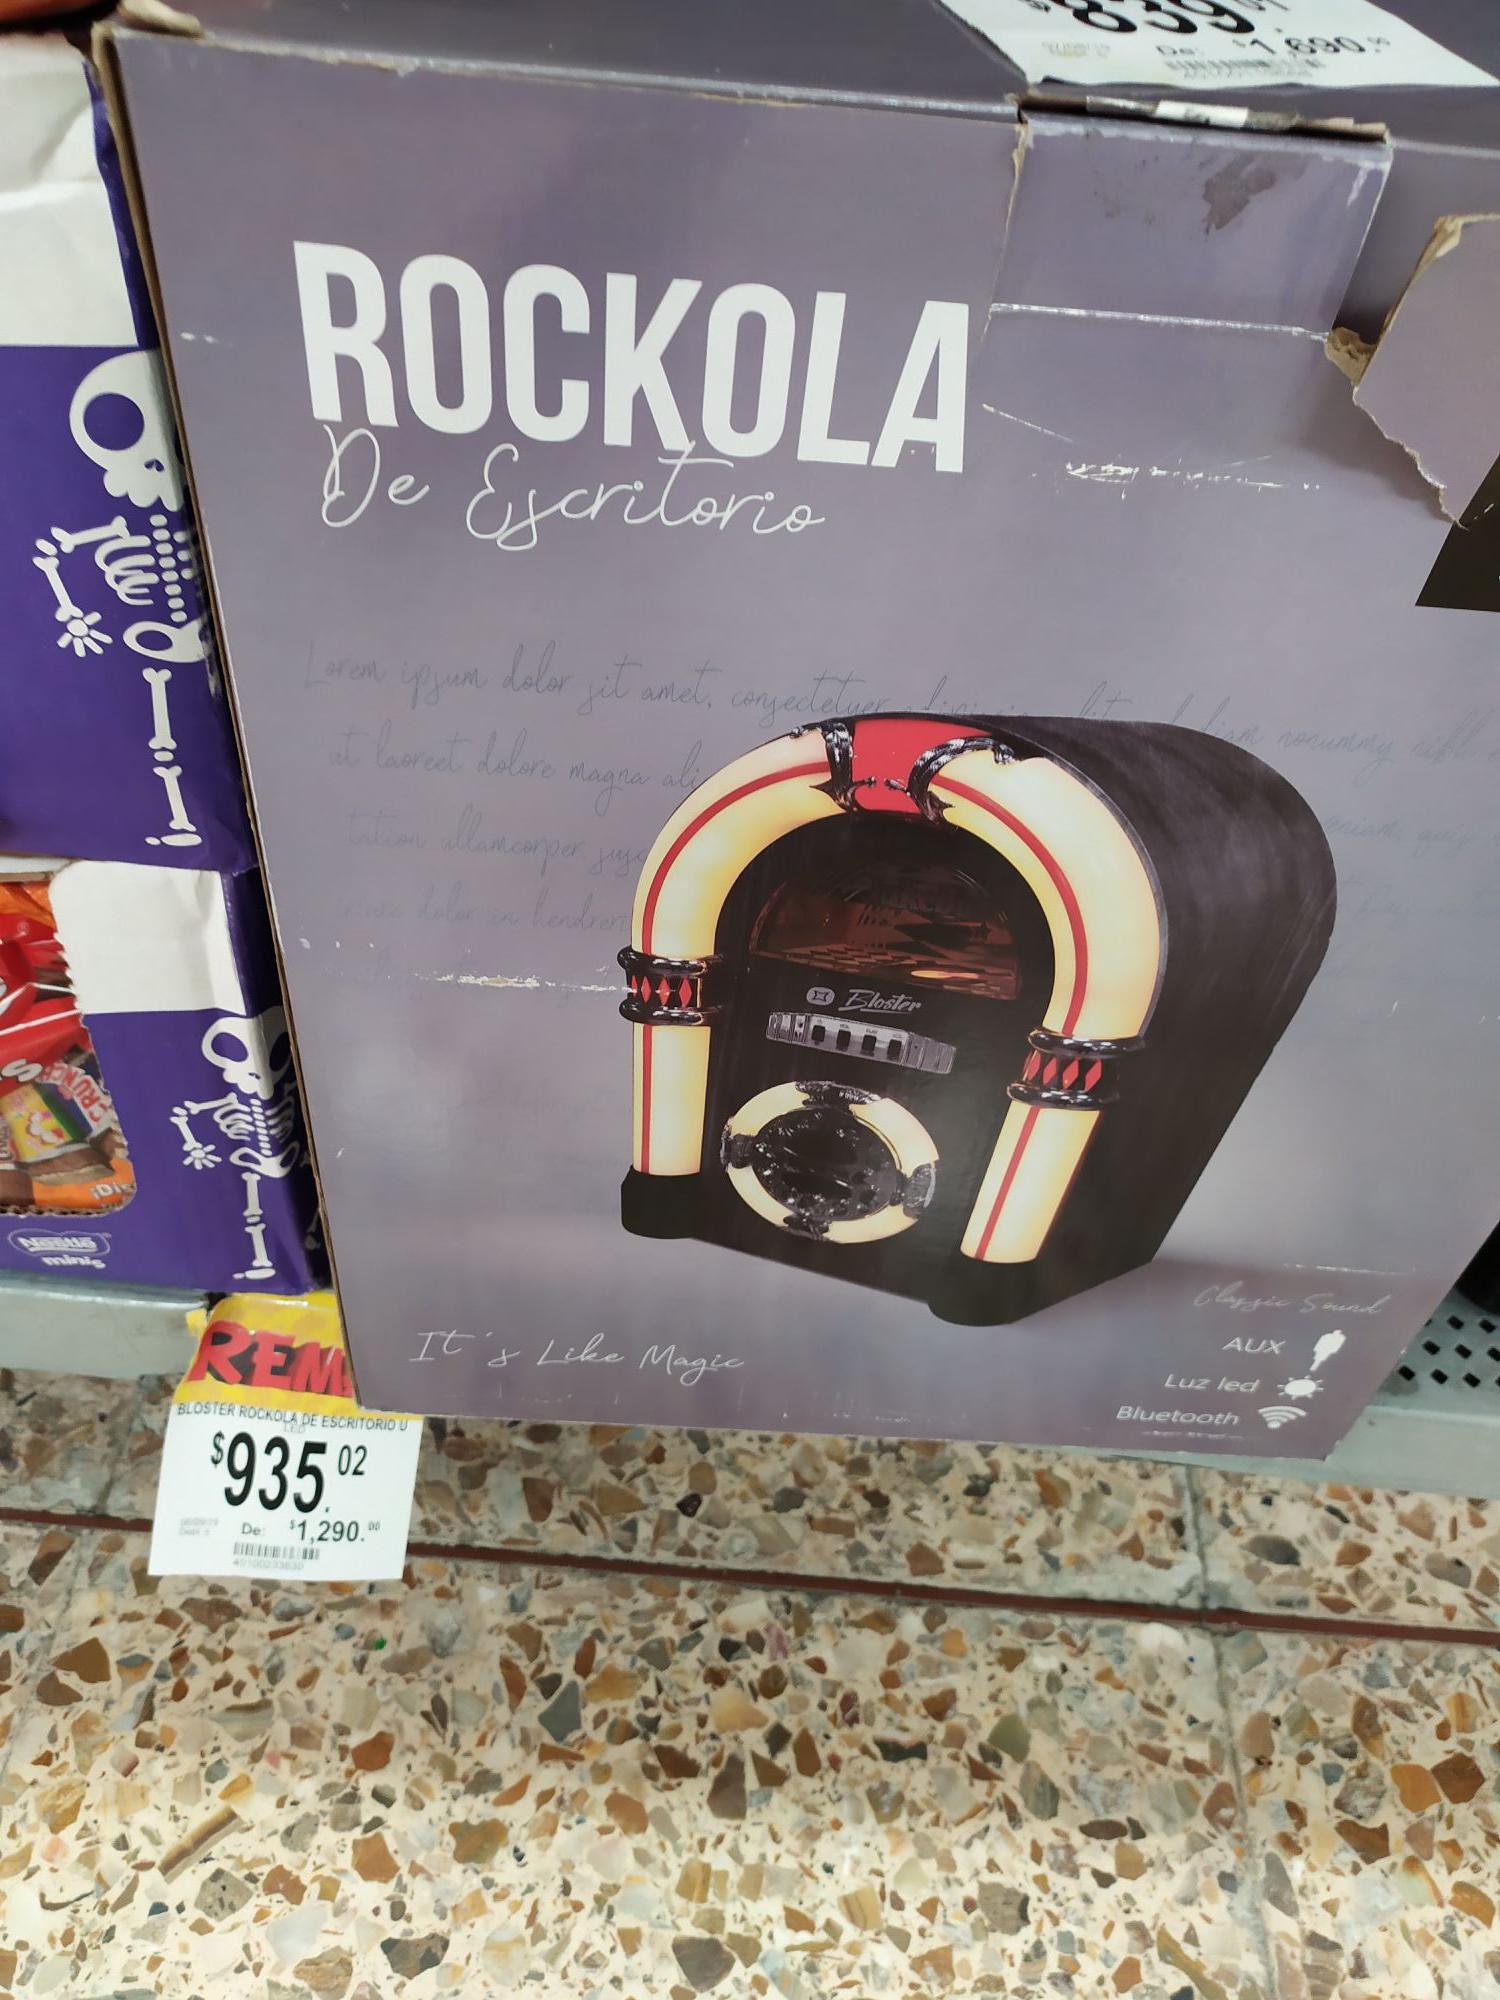 Bodega Aurrera: Rockola Bluetooth